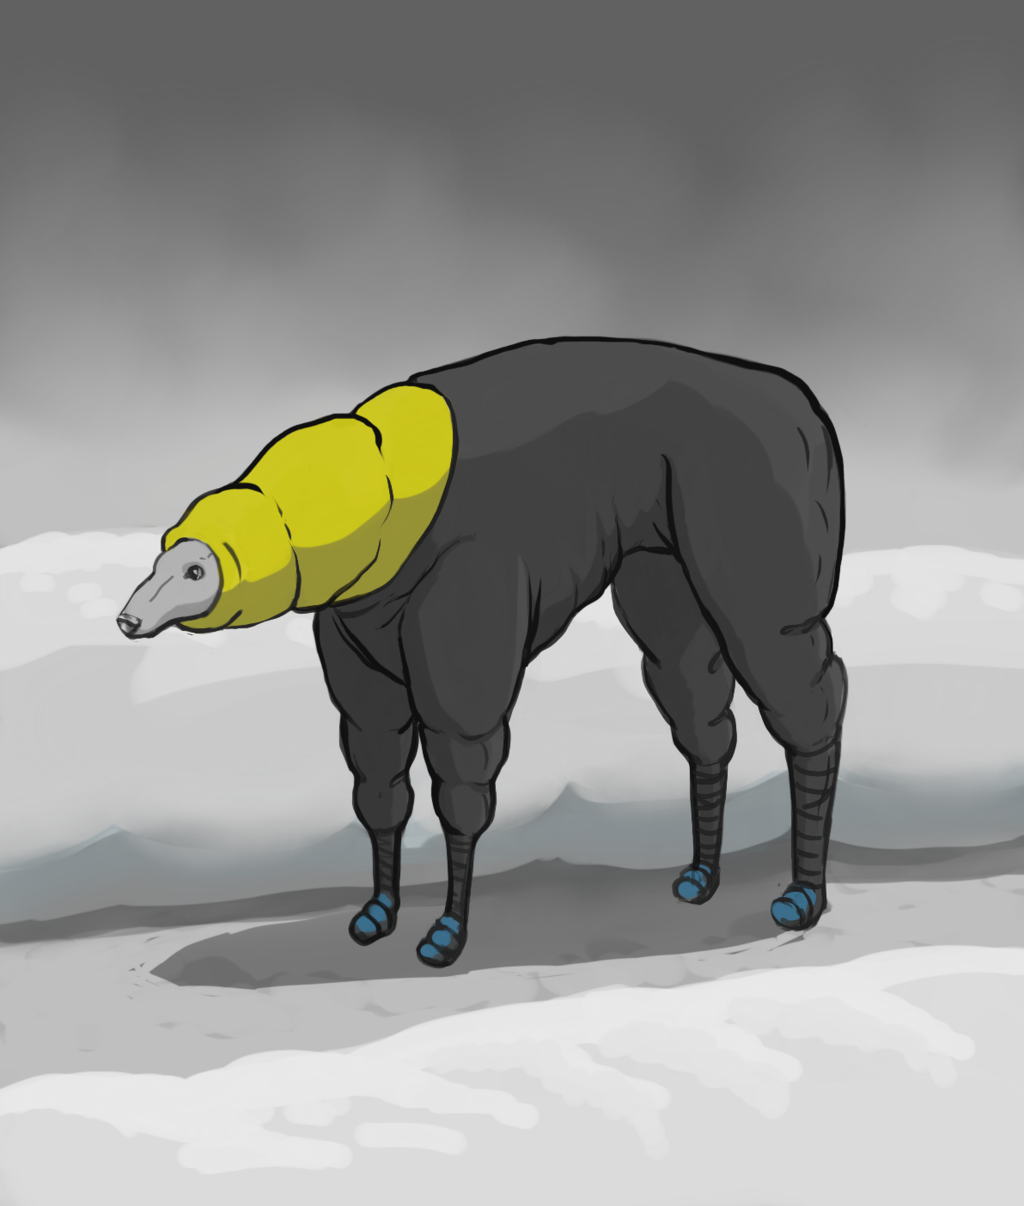 Most recent image: snow-dog